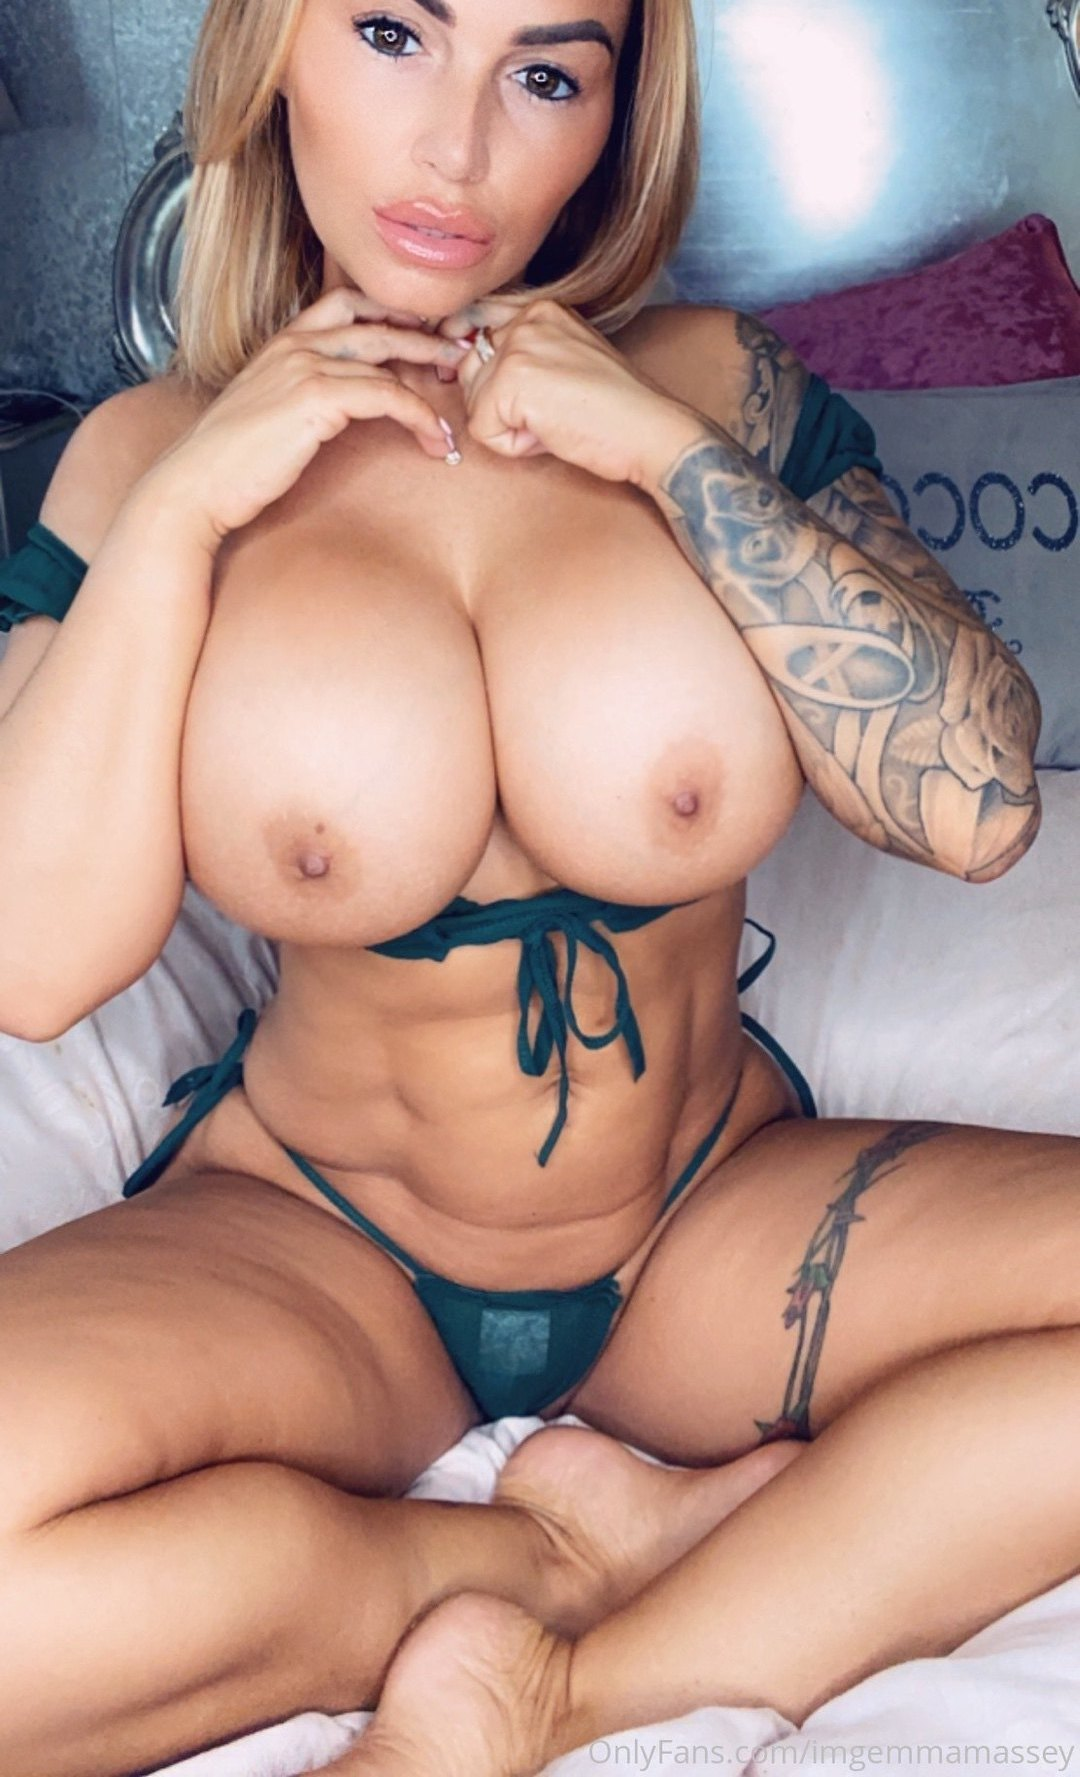 Gemma Massey Imgemmamassey Onlyfans Nudes Leaks 0042